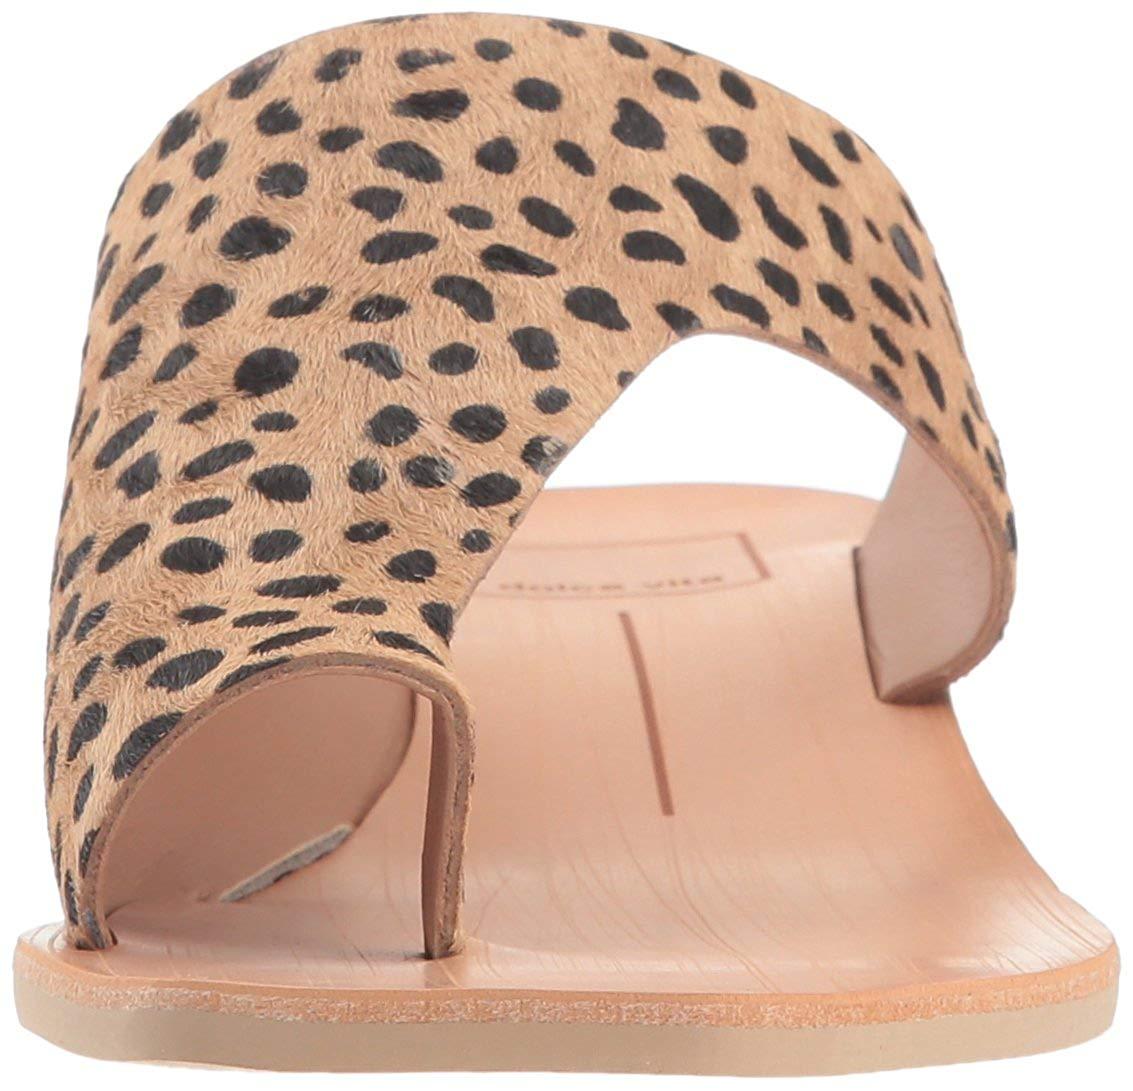 Dolce Vita Women's Hazle Slide Sandal, MultiColor, Size 8.5